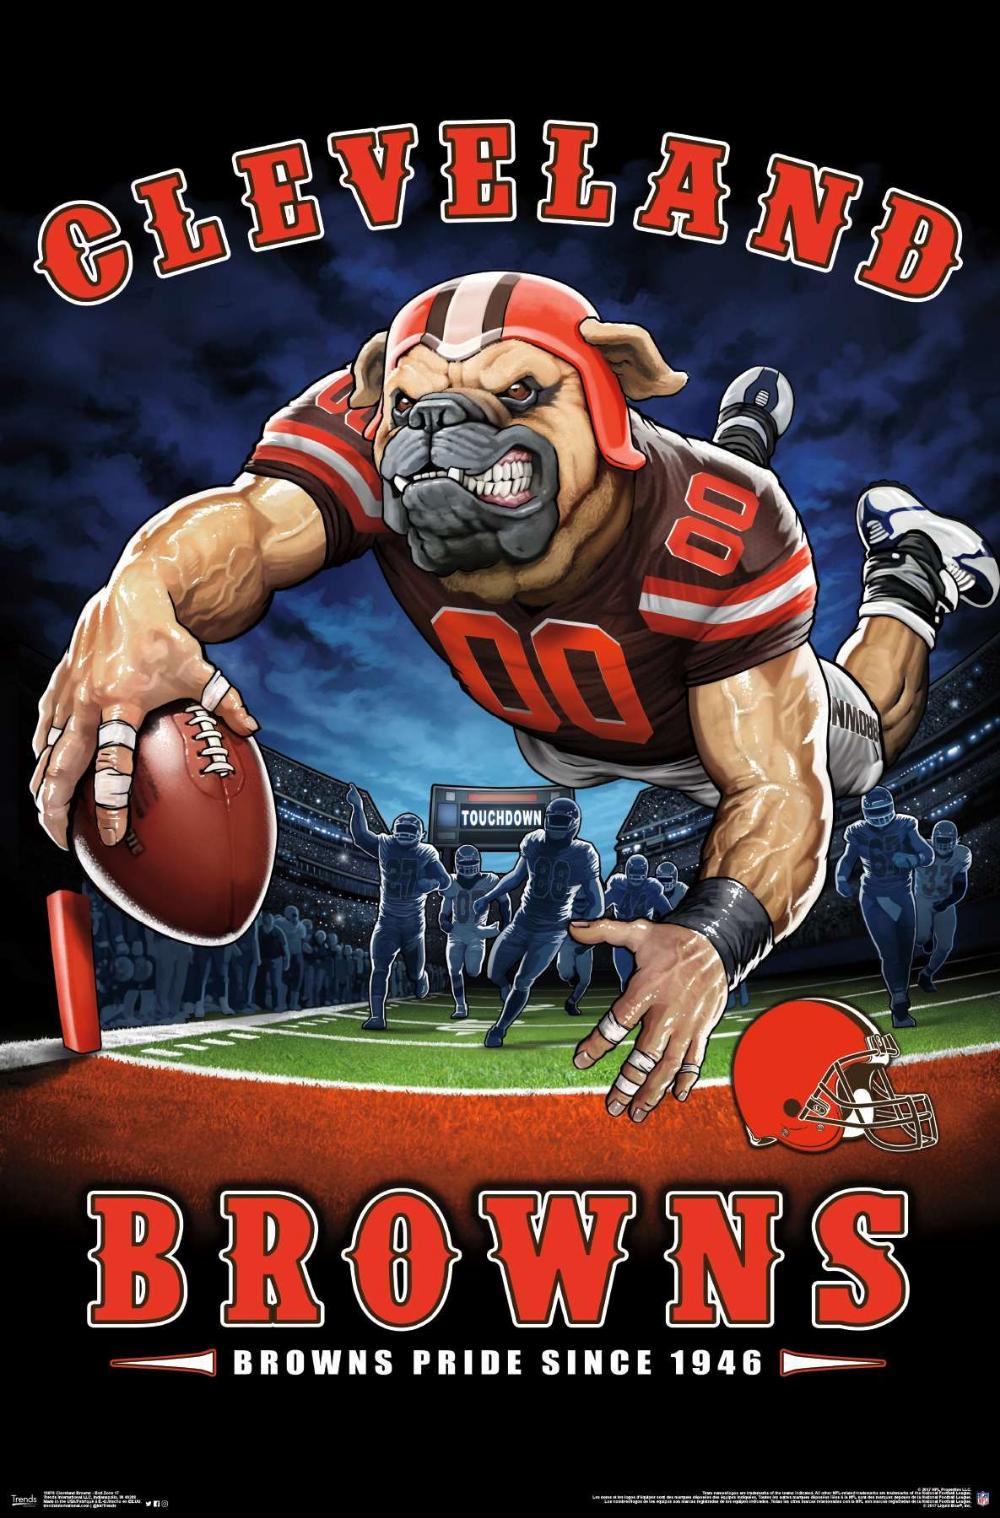 Nfl Cleveland Browns End Zone Nfl Cleveland Browns Cleveland Browns Football Football Poster